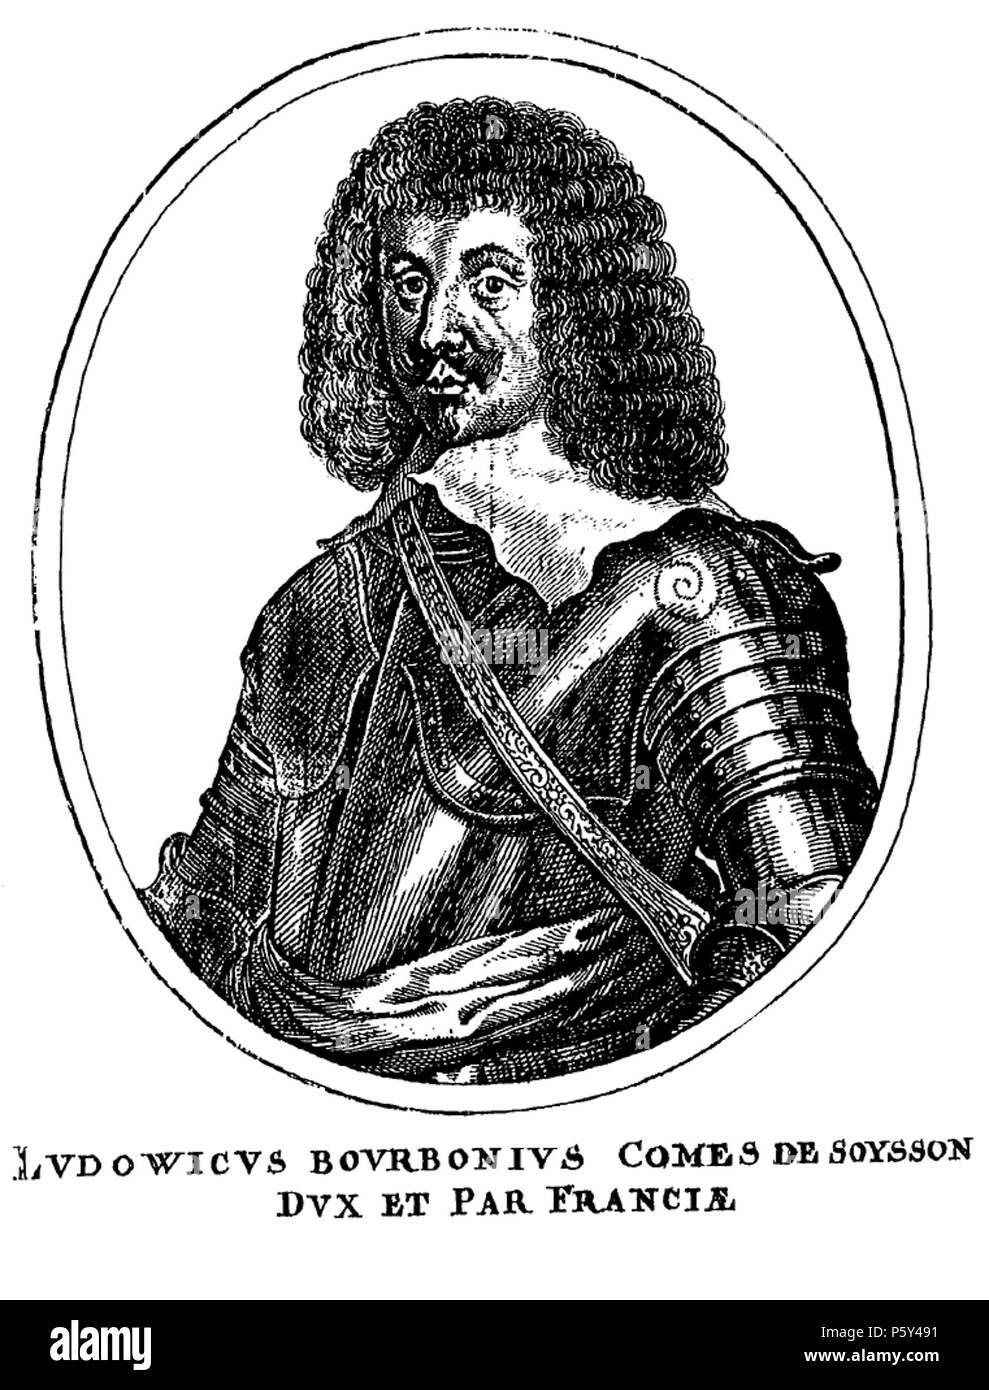 516 Engraving of Louis de Bourbon (1604-1641), Count of Soissons by Matthäus Merian (1) Stock Photo